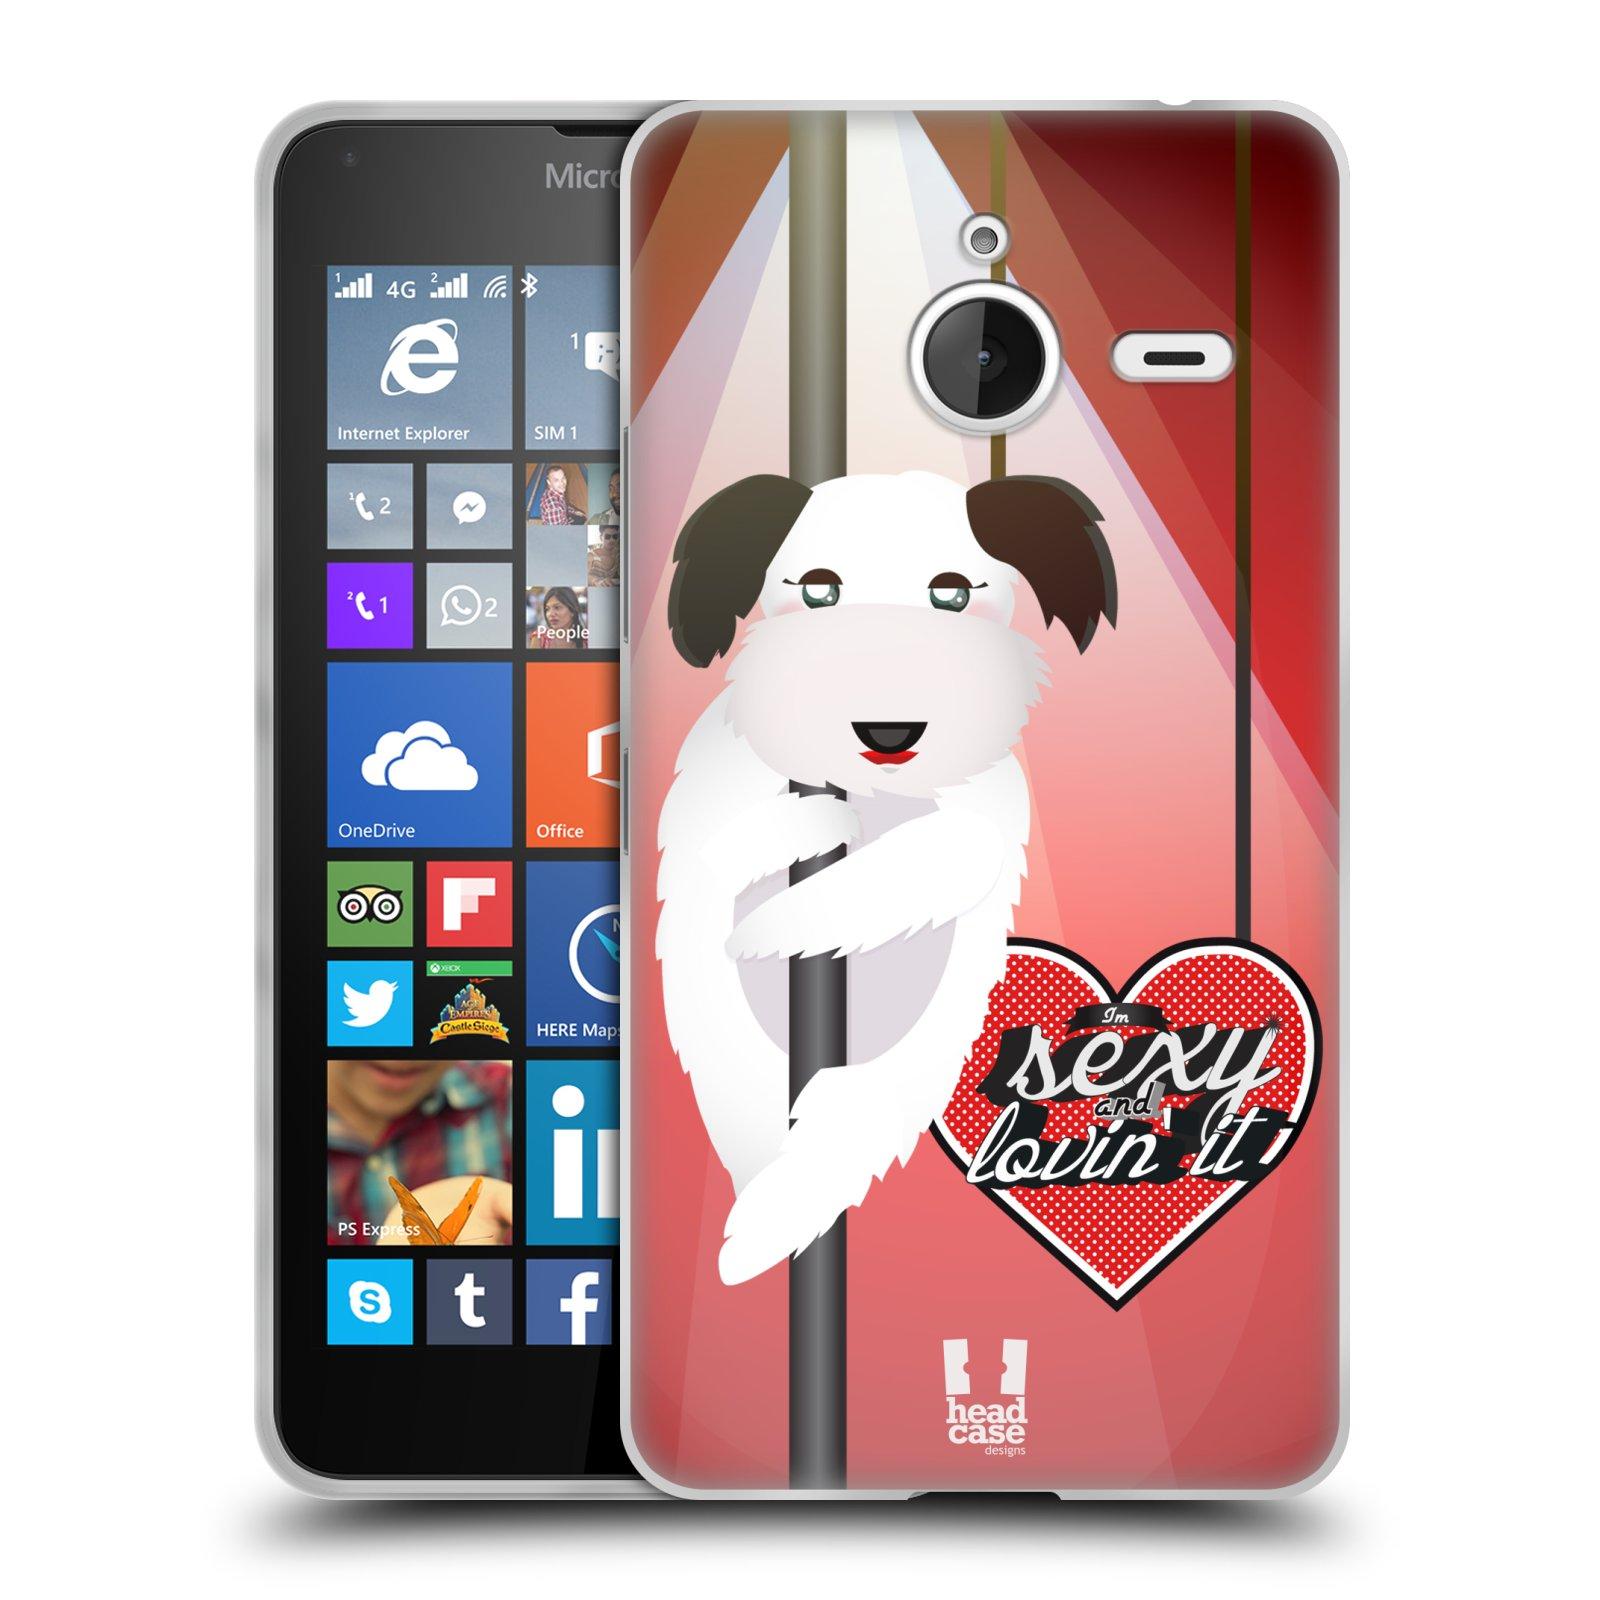 HEAD CASE silikonový obal na mobil Microsoft Lumia 640 XL / Lumia 640 XL DUAL vzor tančící zvířátka pejsek